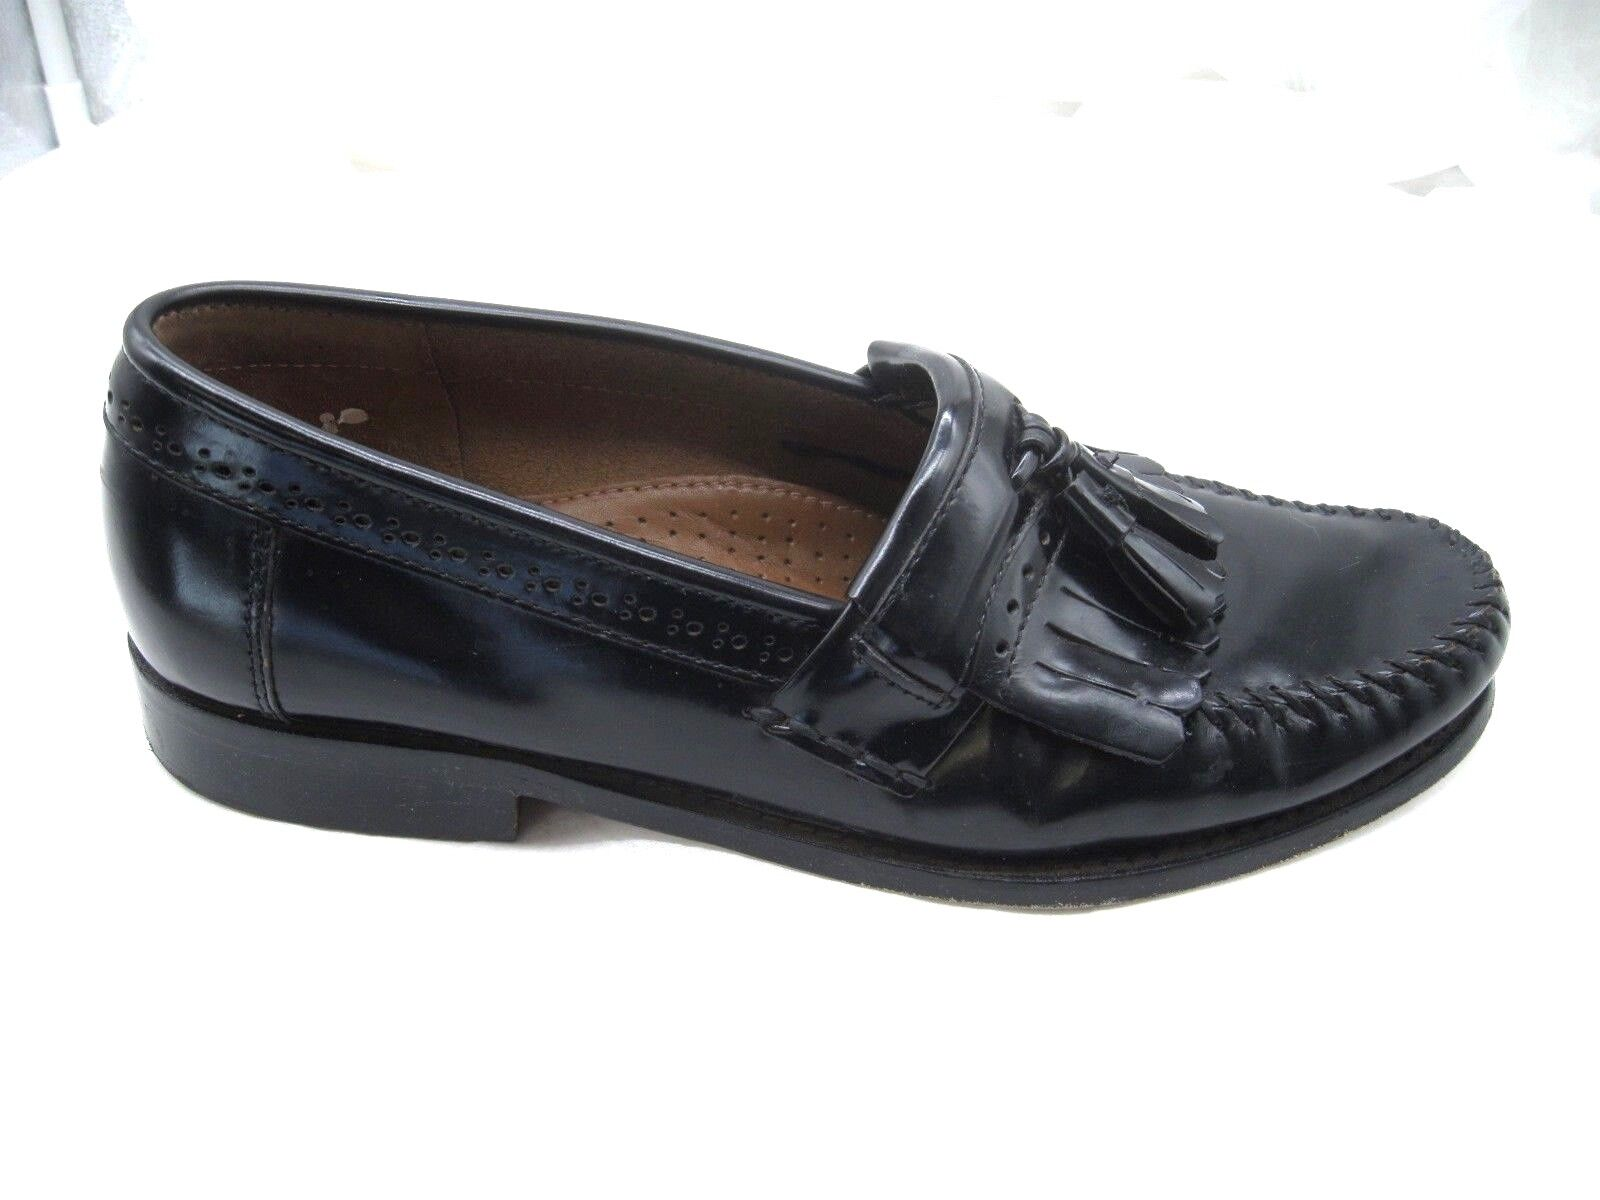 Bass & Co. Weejuns Jeremy black kiltie tassel dress loafers Mens 9D 42 shoes